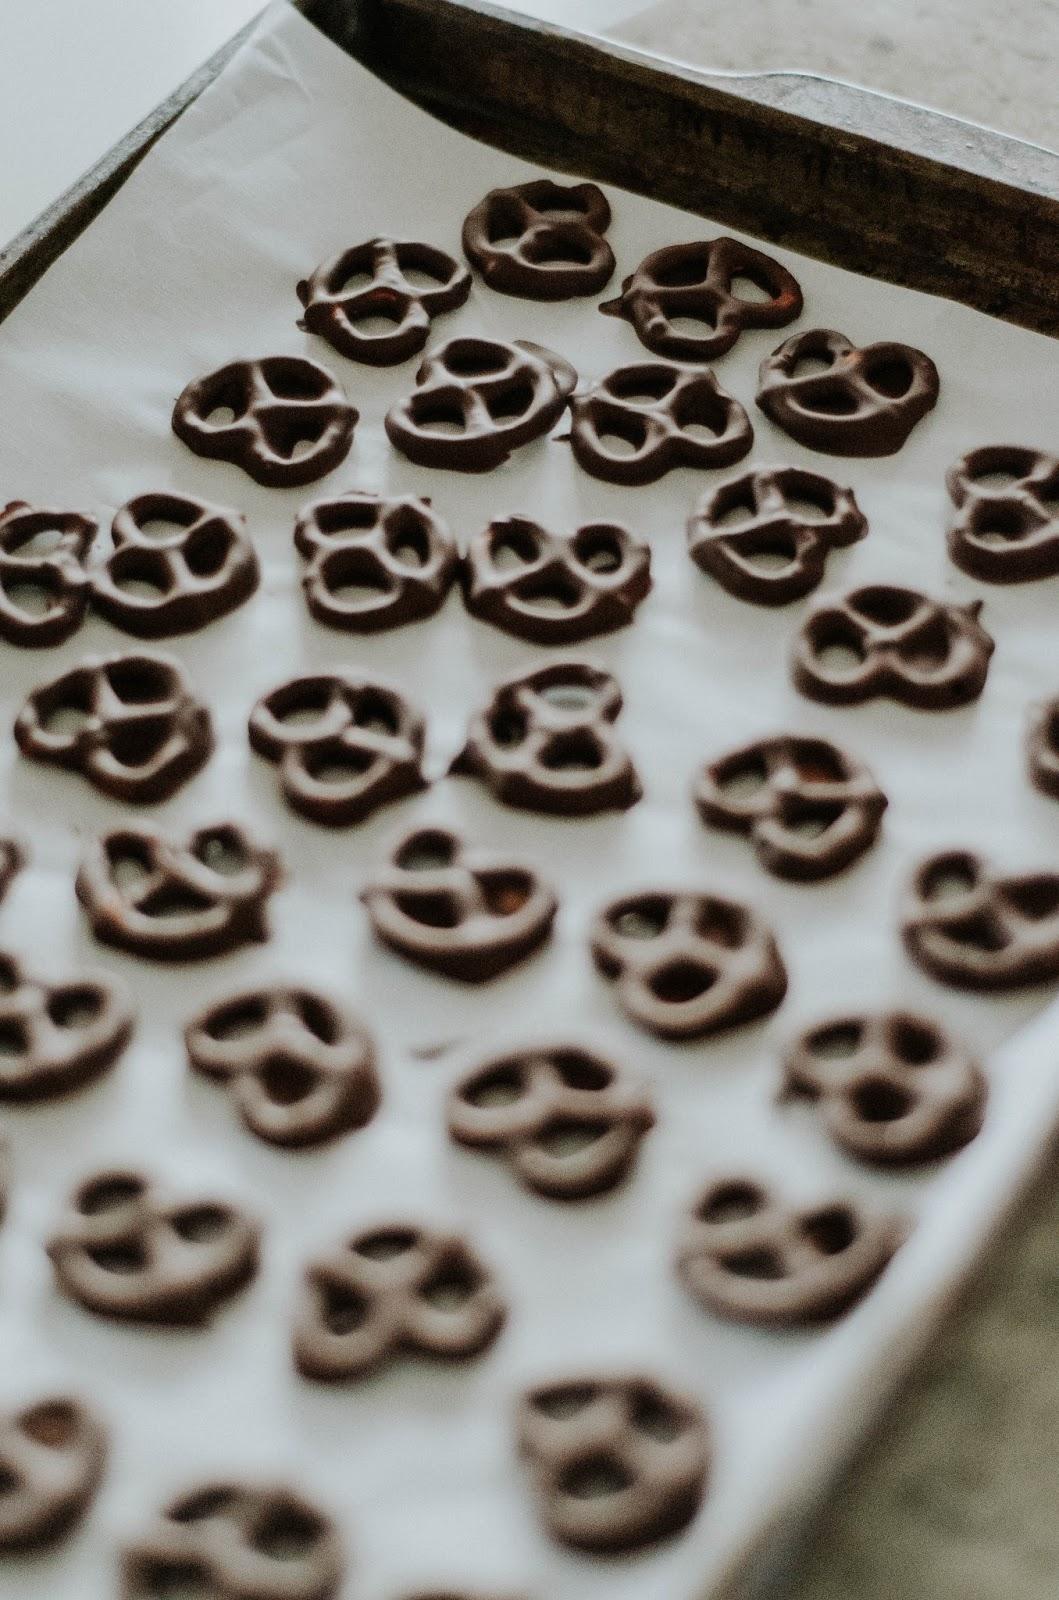 gluten-free-salted-espresso-infused-dark-chocolate-covered-pretzels-the-nosh-life